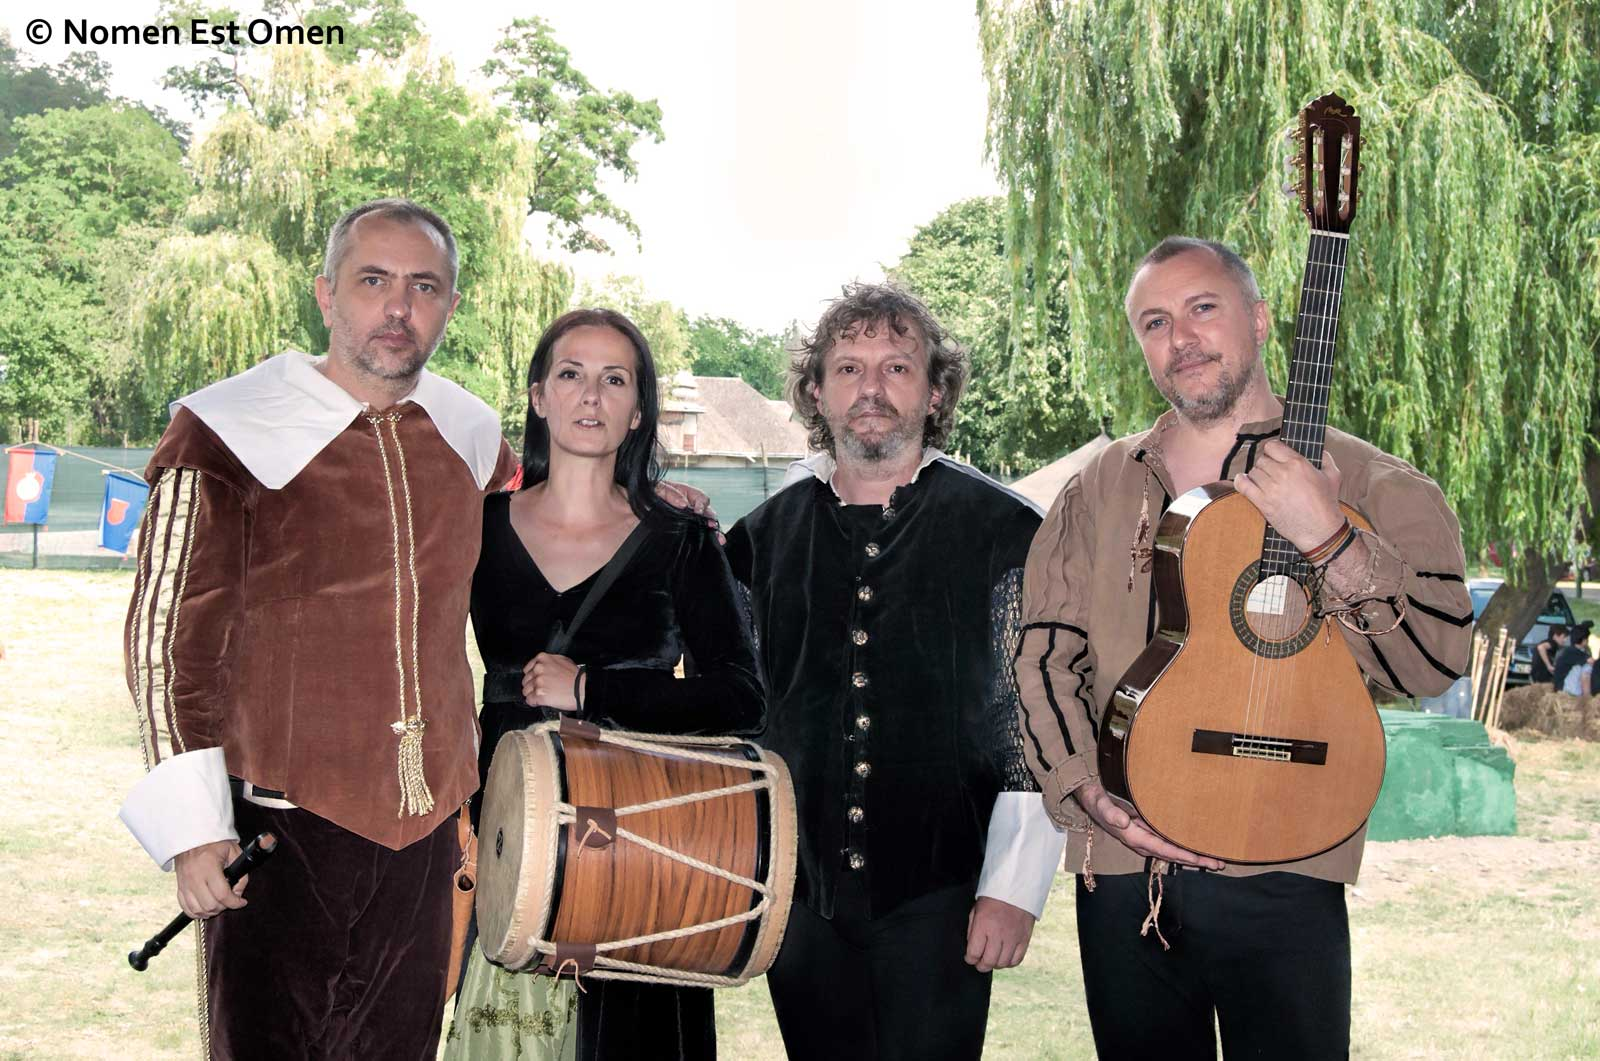 Nomen Est Omen la Festivalul Medieval de la Targu Neamt 2015